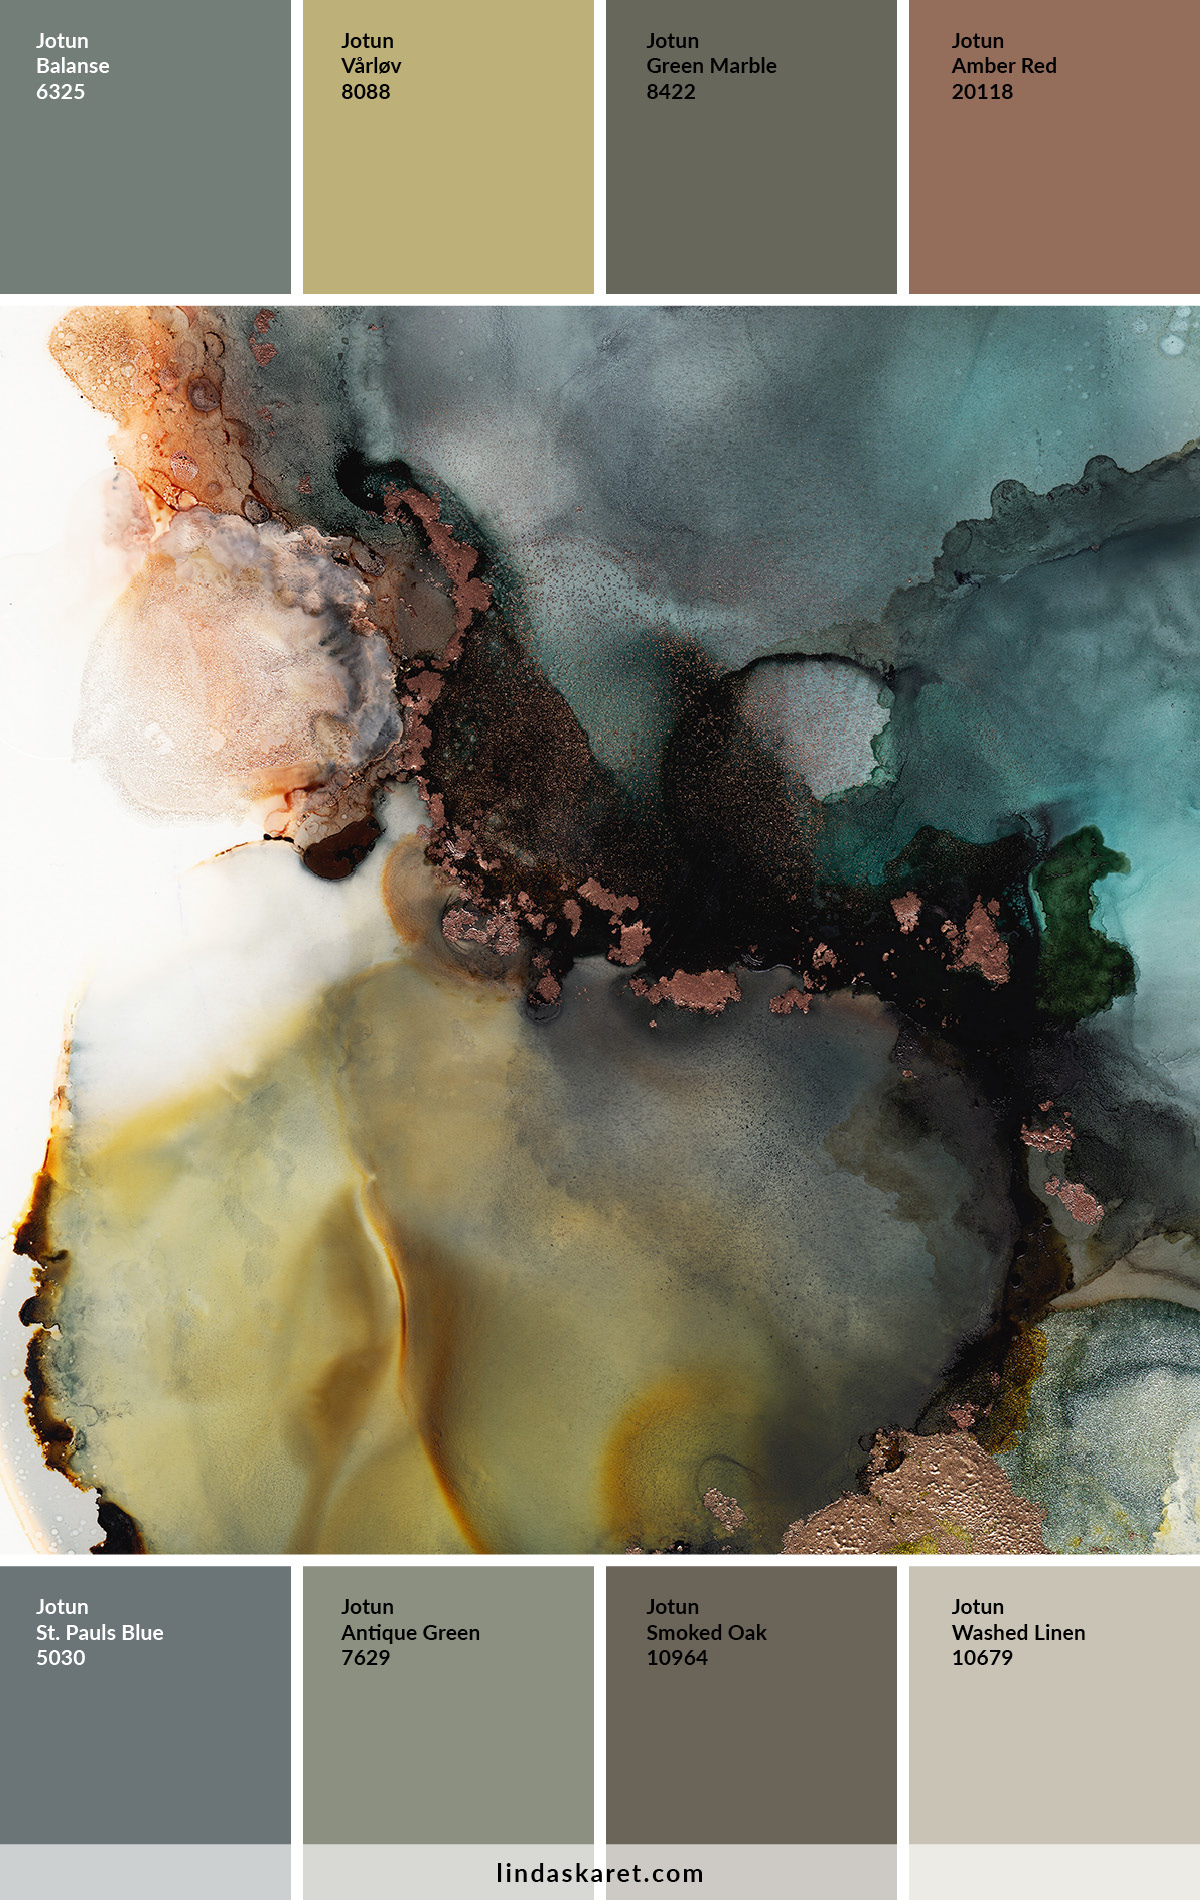 eecaca5e modern-art-Earth-lindaskaret_.jpg